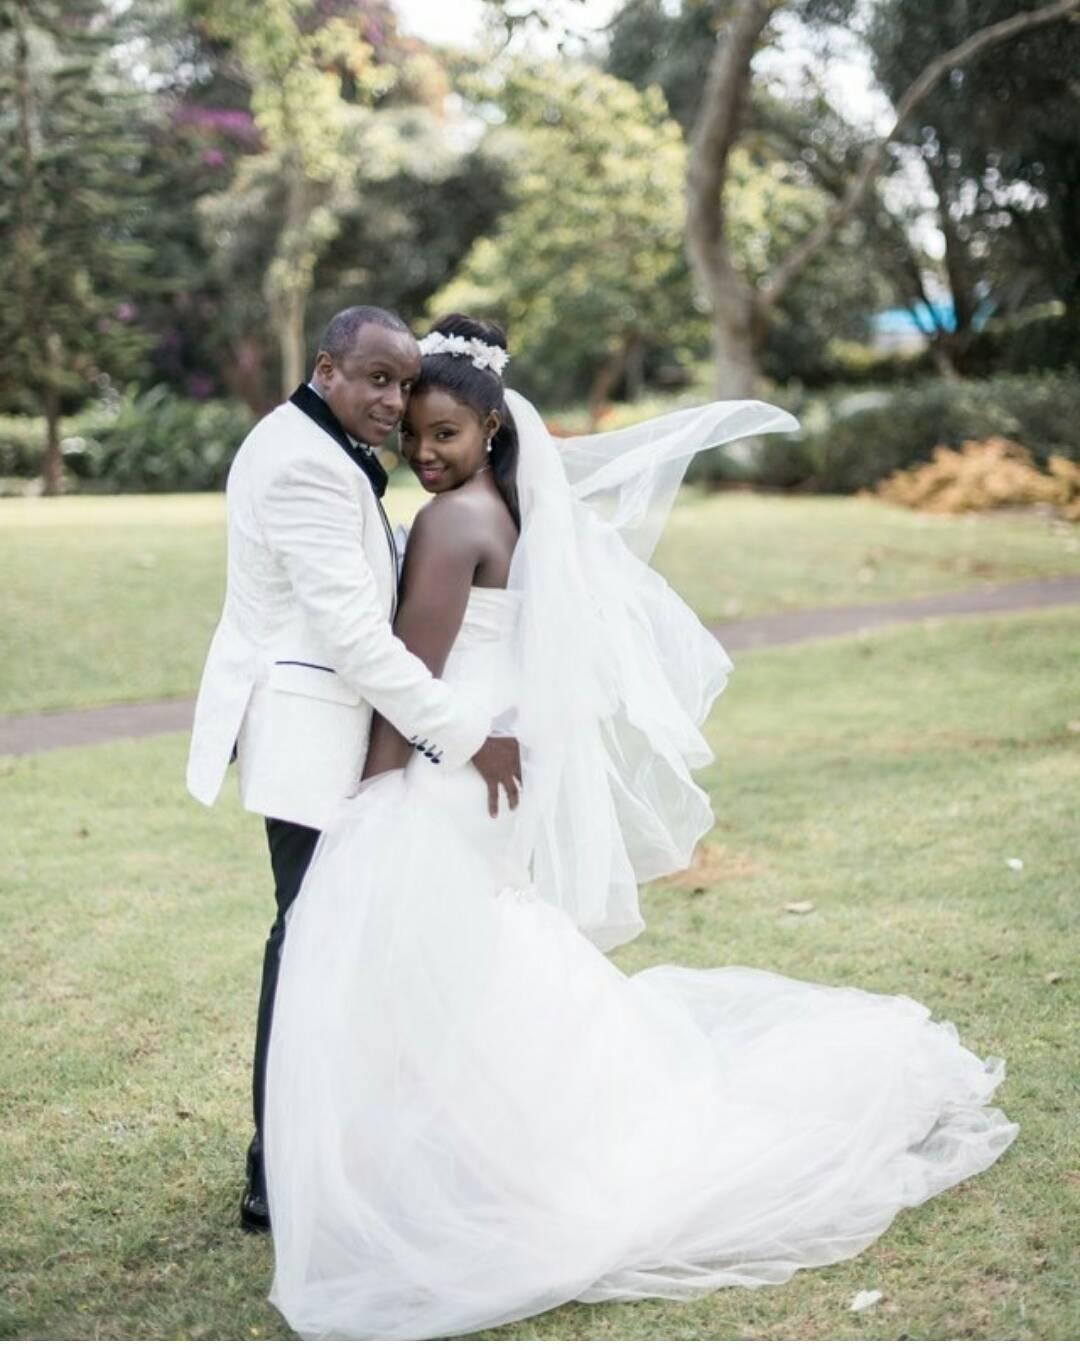 Catherine Kamau and her husband Phil Karanja during their wedding. Photo/Instagram